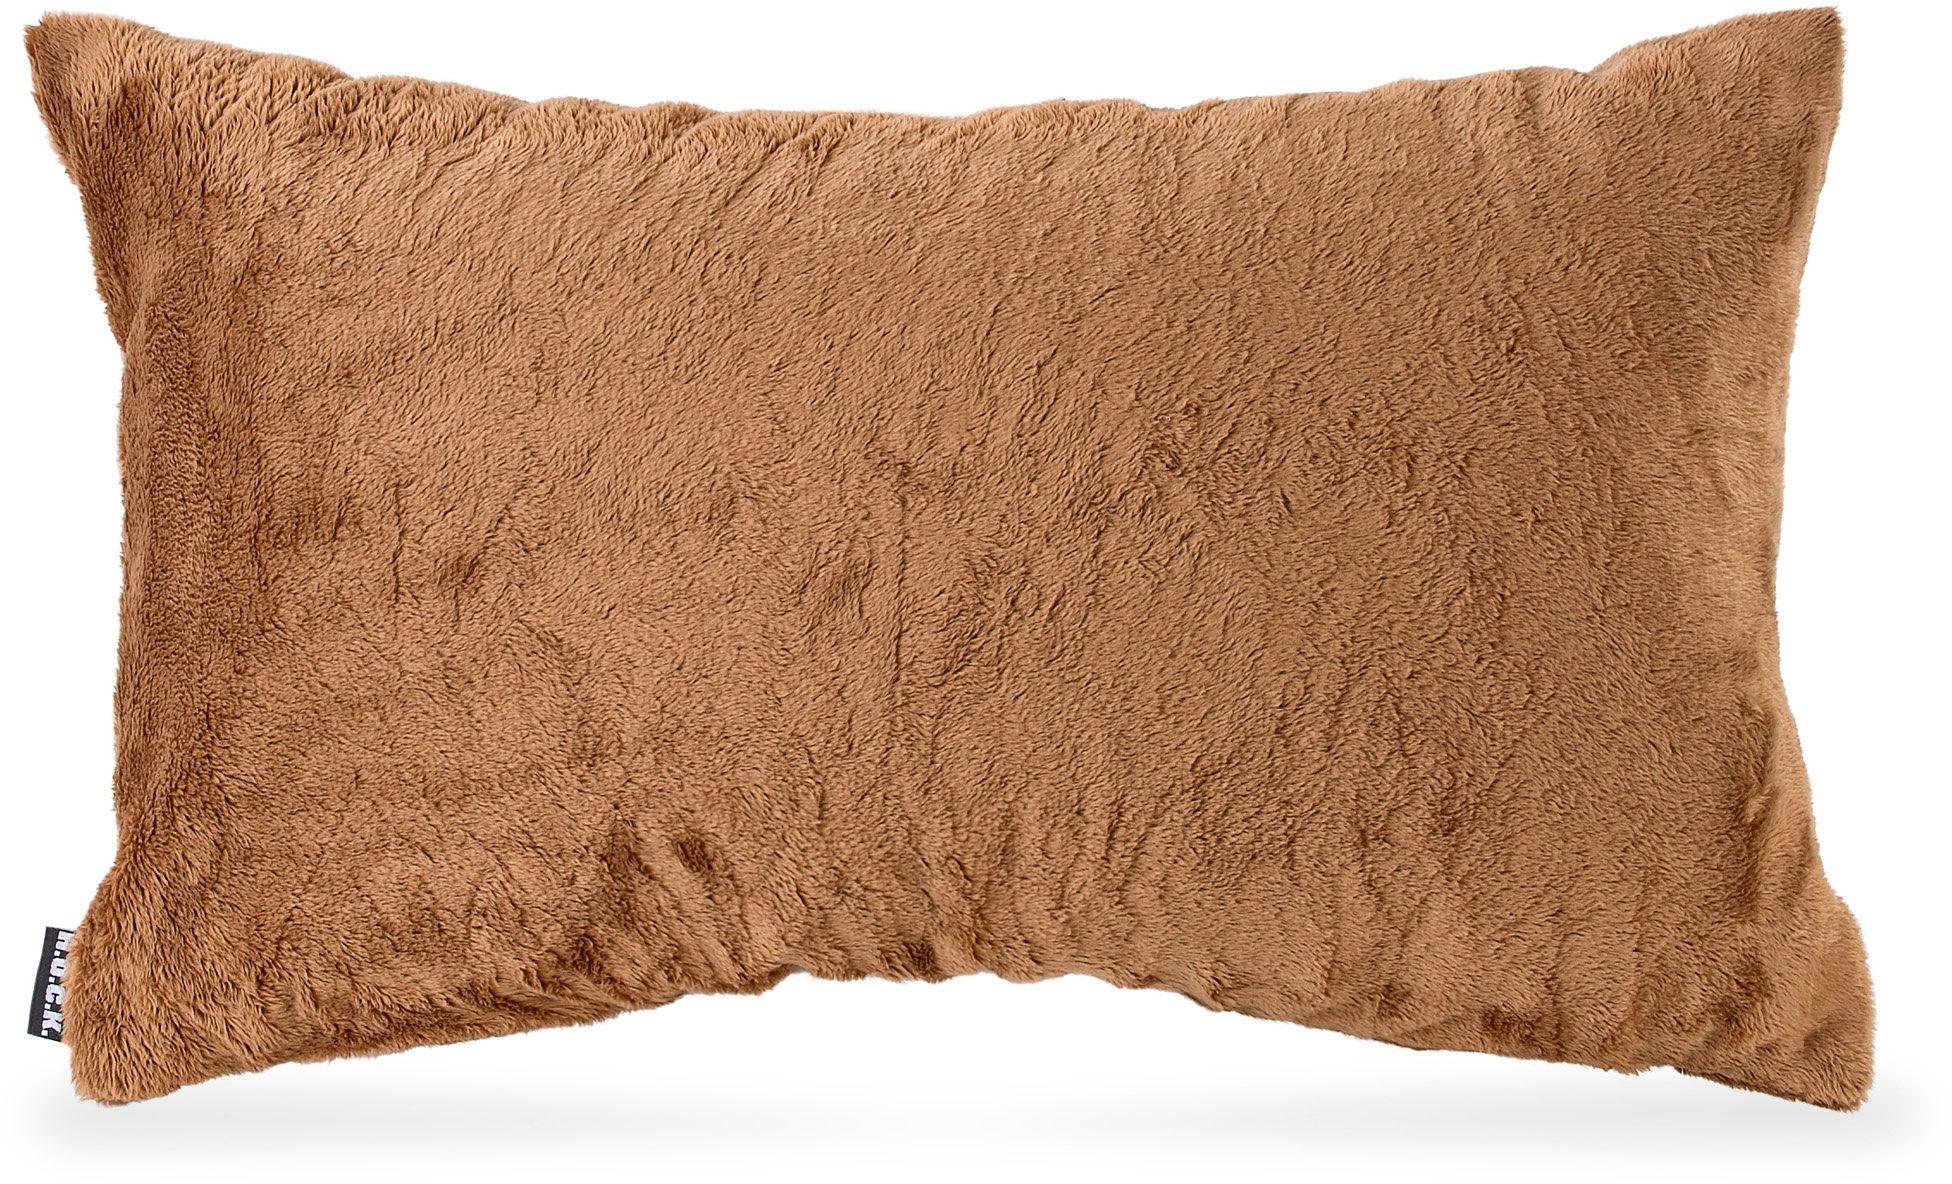 Hock Kissen »Grizzly« 50x30 cm